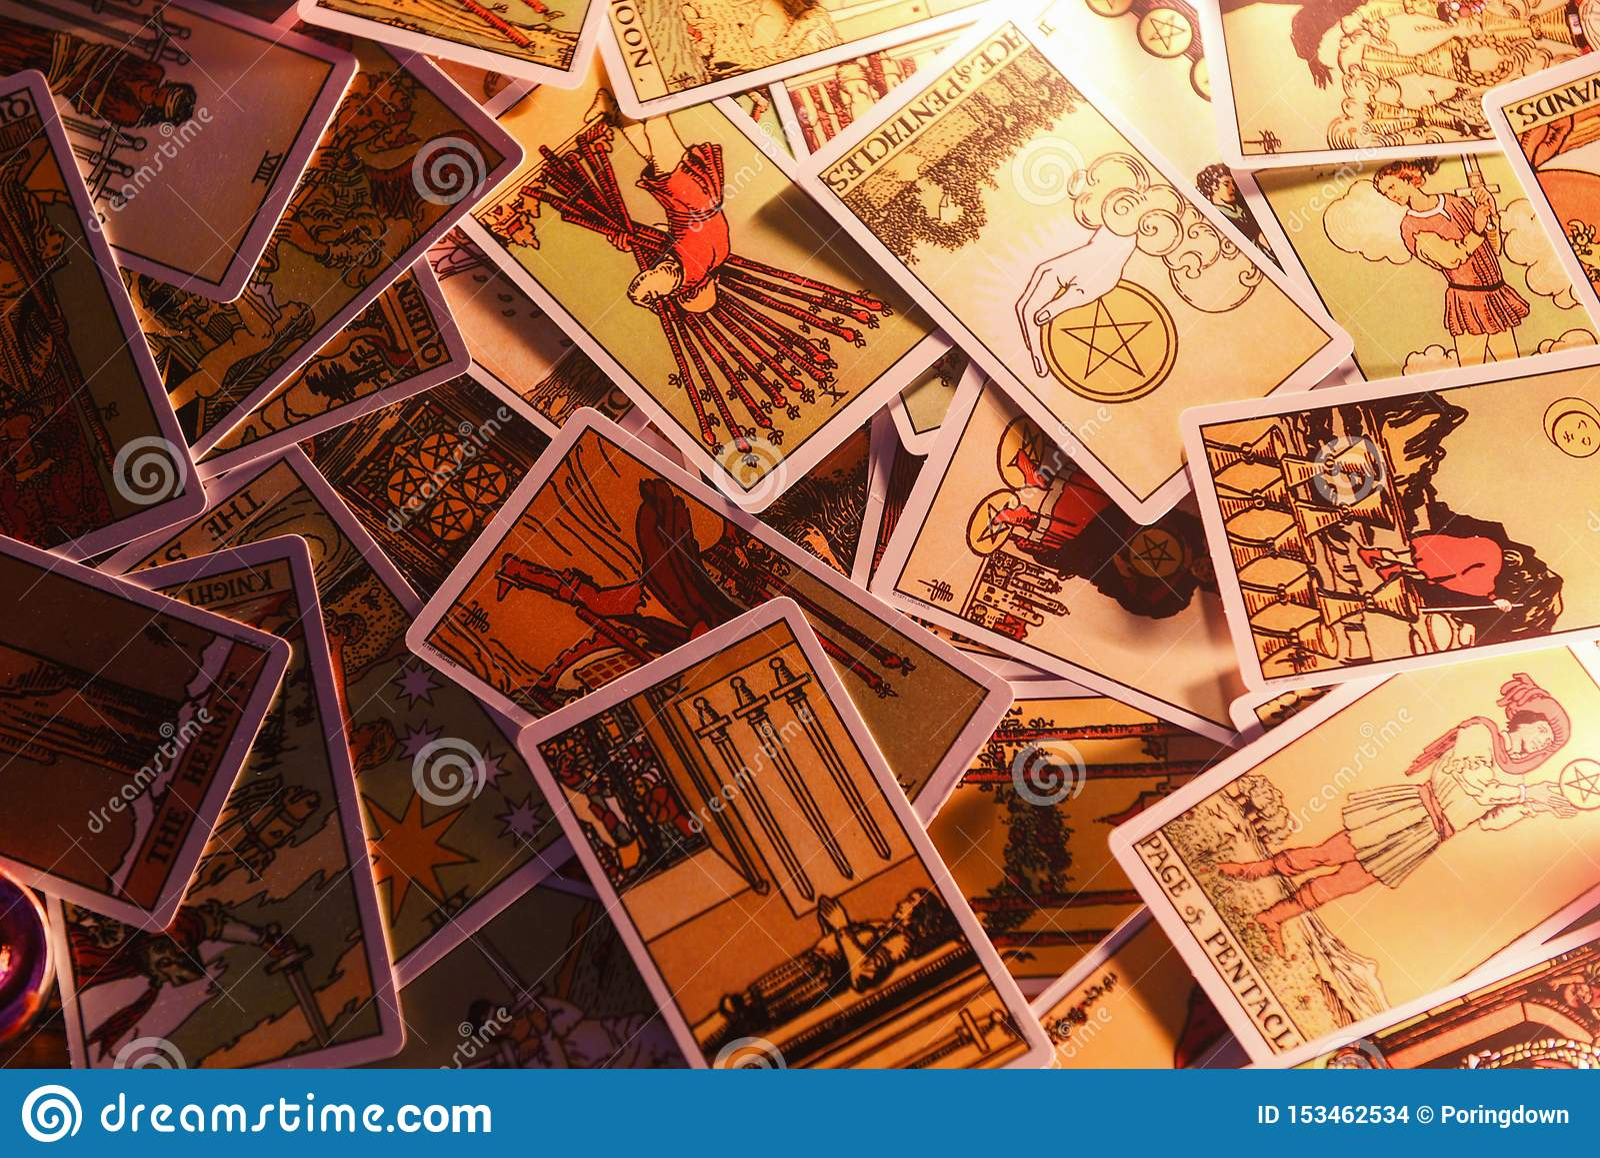 Tarot读书通灵占卜的占卜用的纸牌